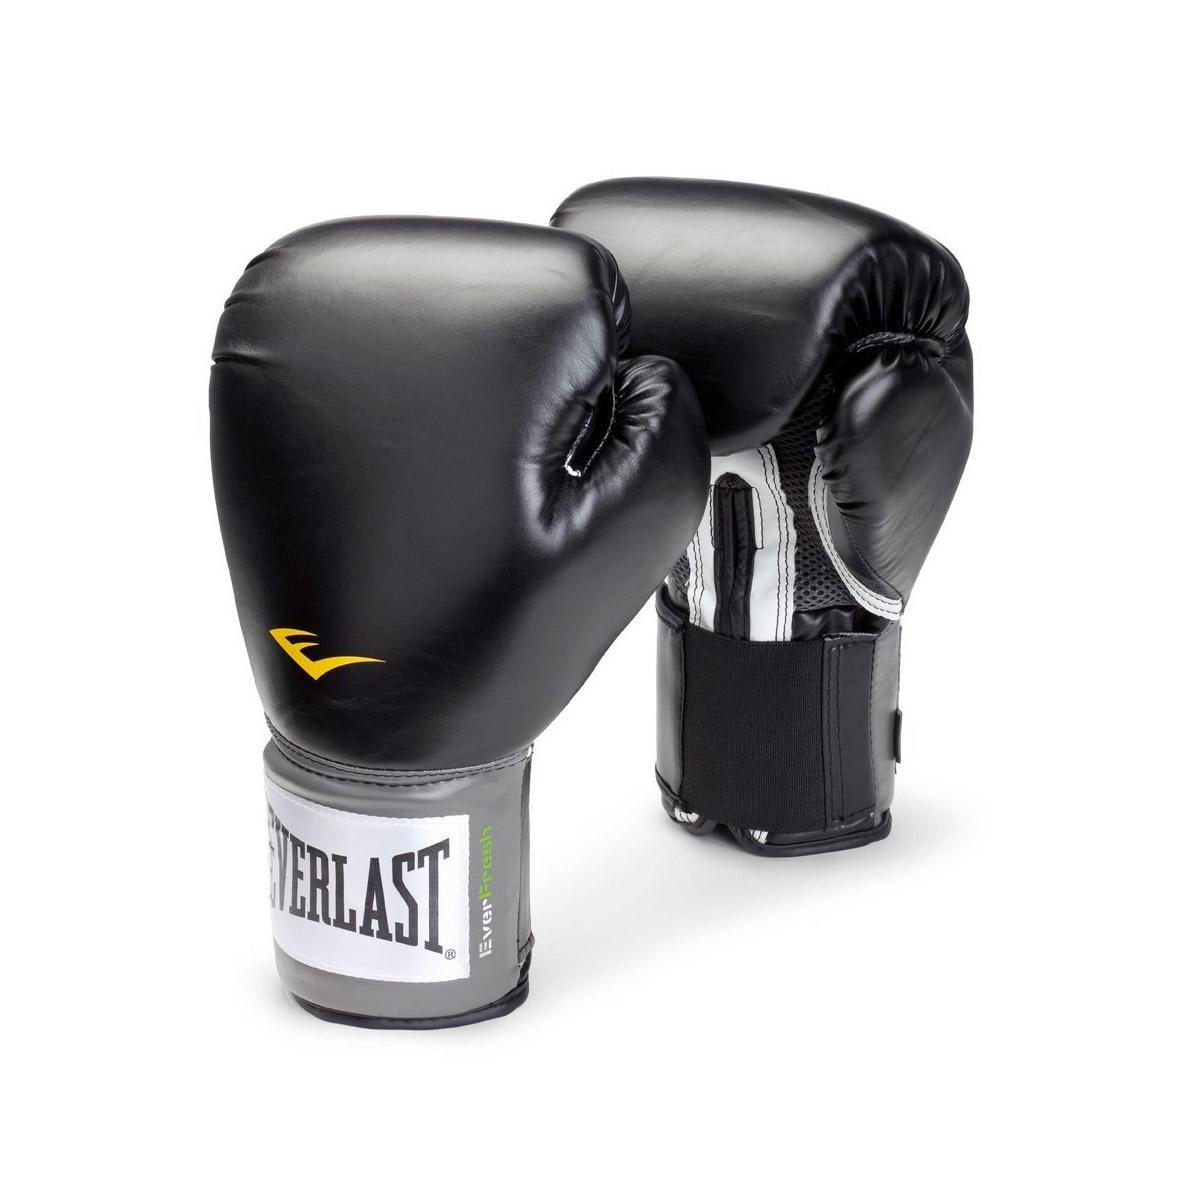 martial arts 1 pair Everlast Blocking Glove Mitts boxing MMA kick boxing